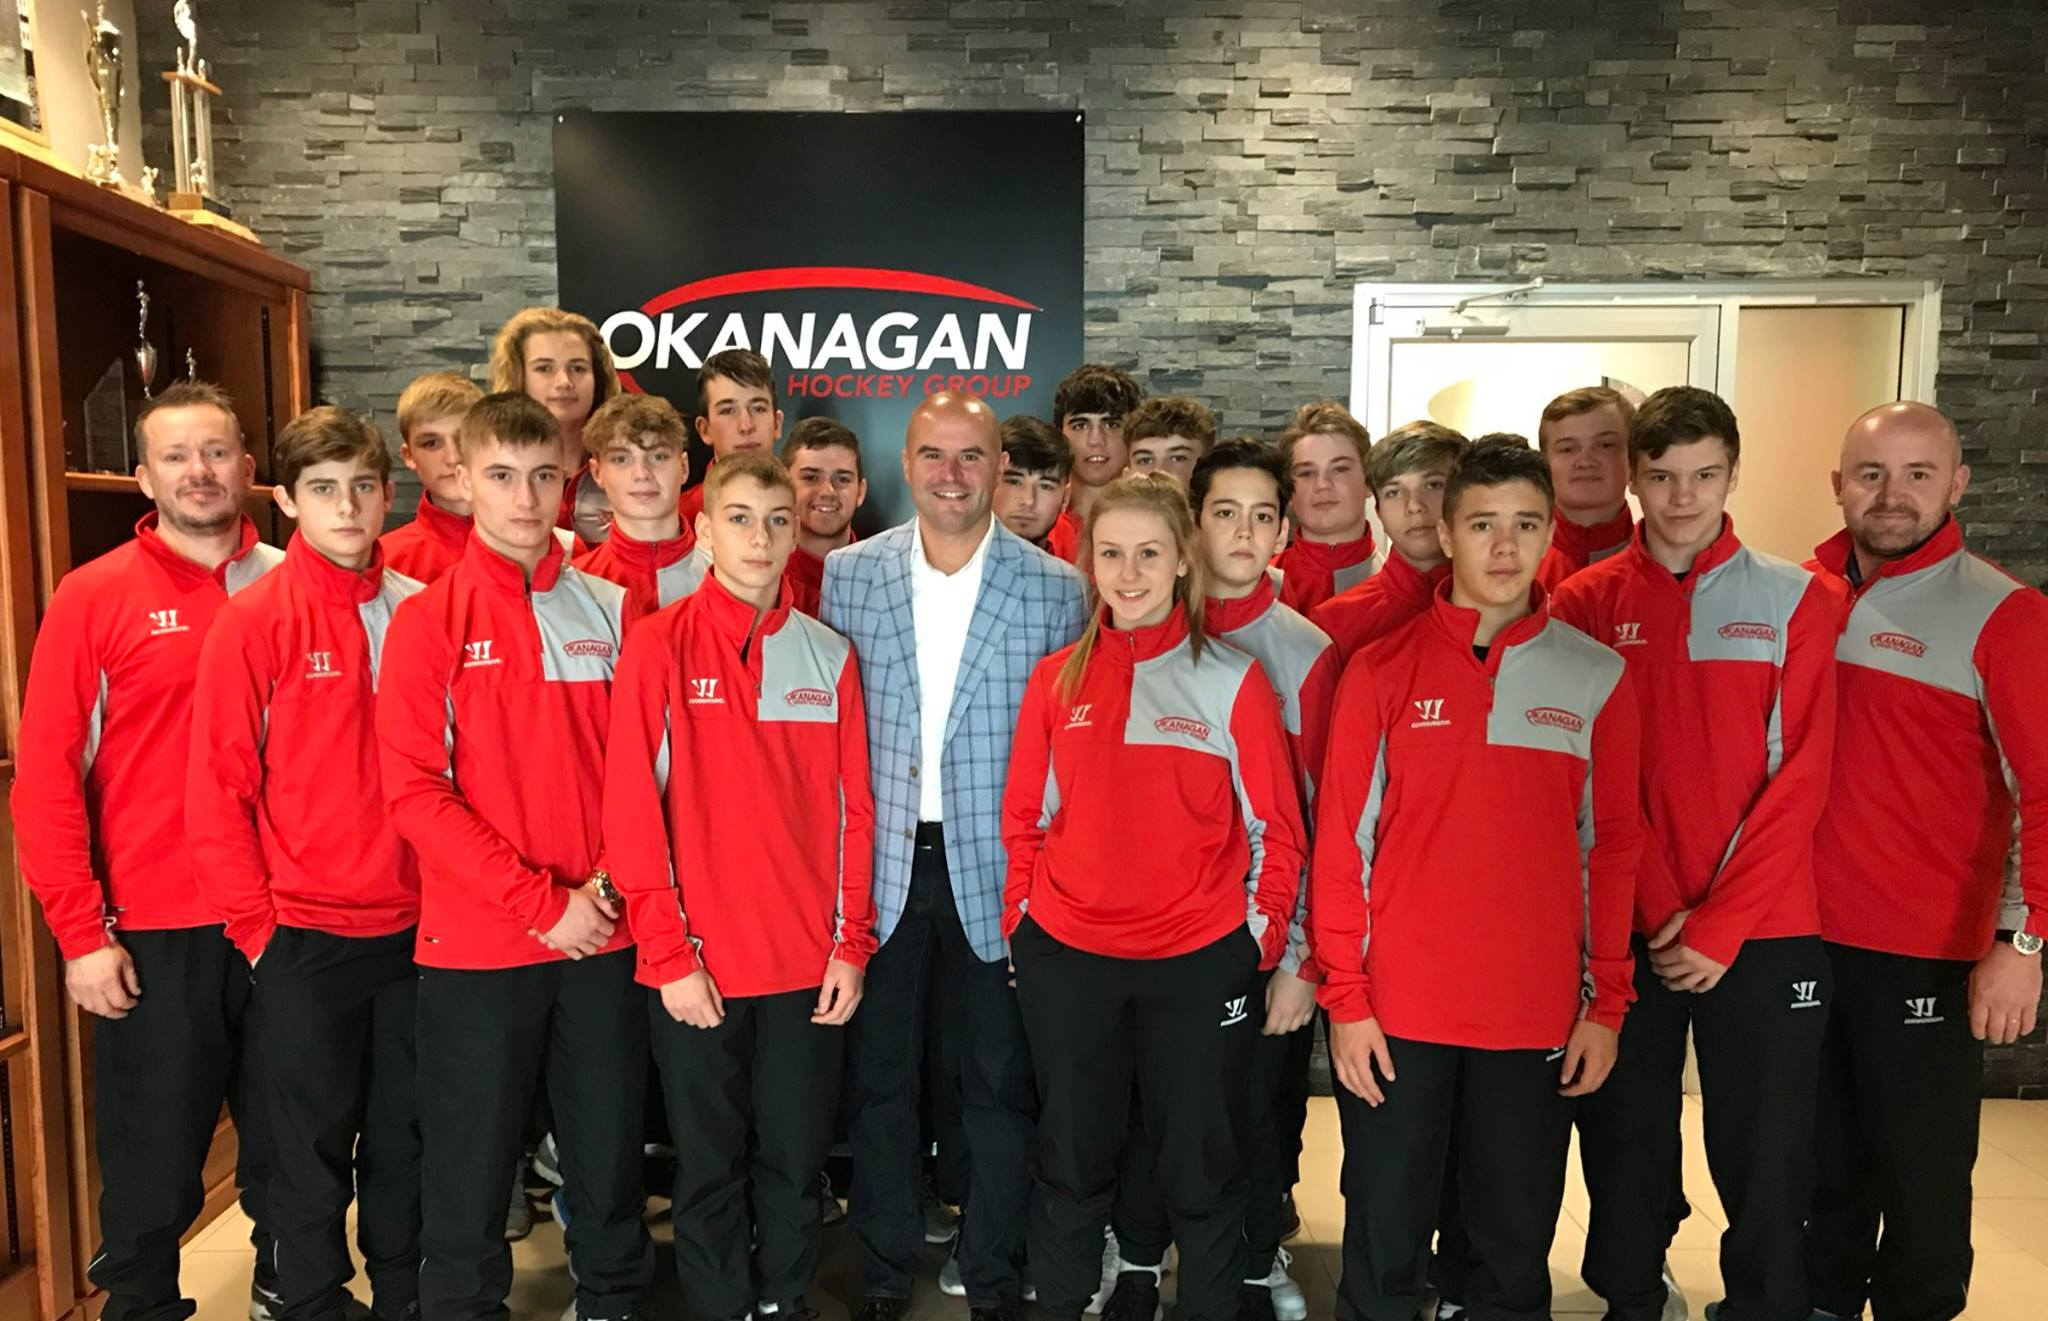 canada trip OHG Okanagan Ice Hockey Academy Junior UK